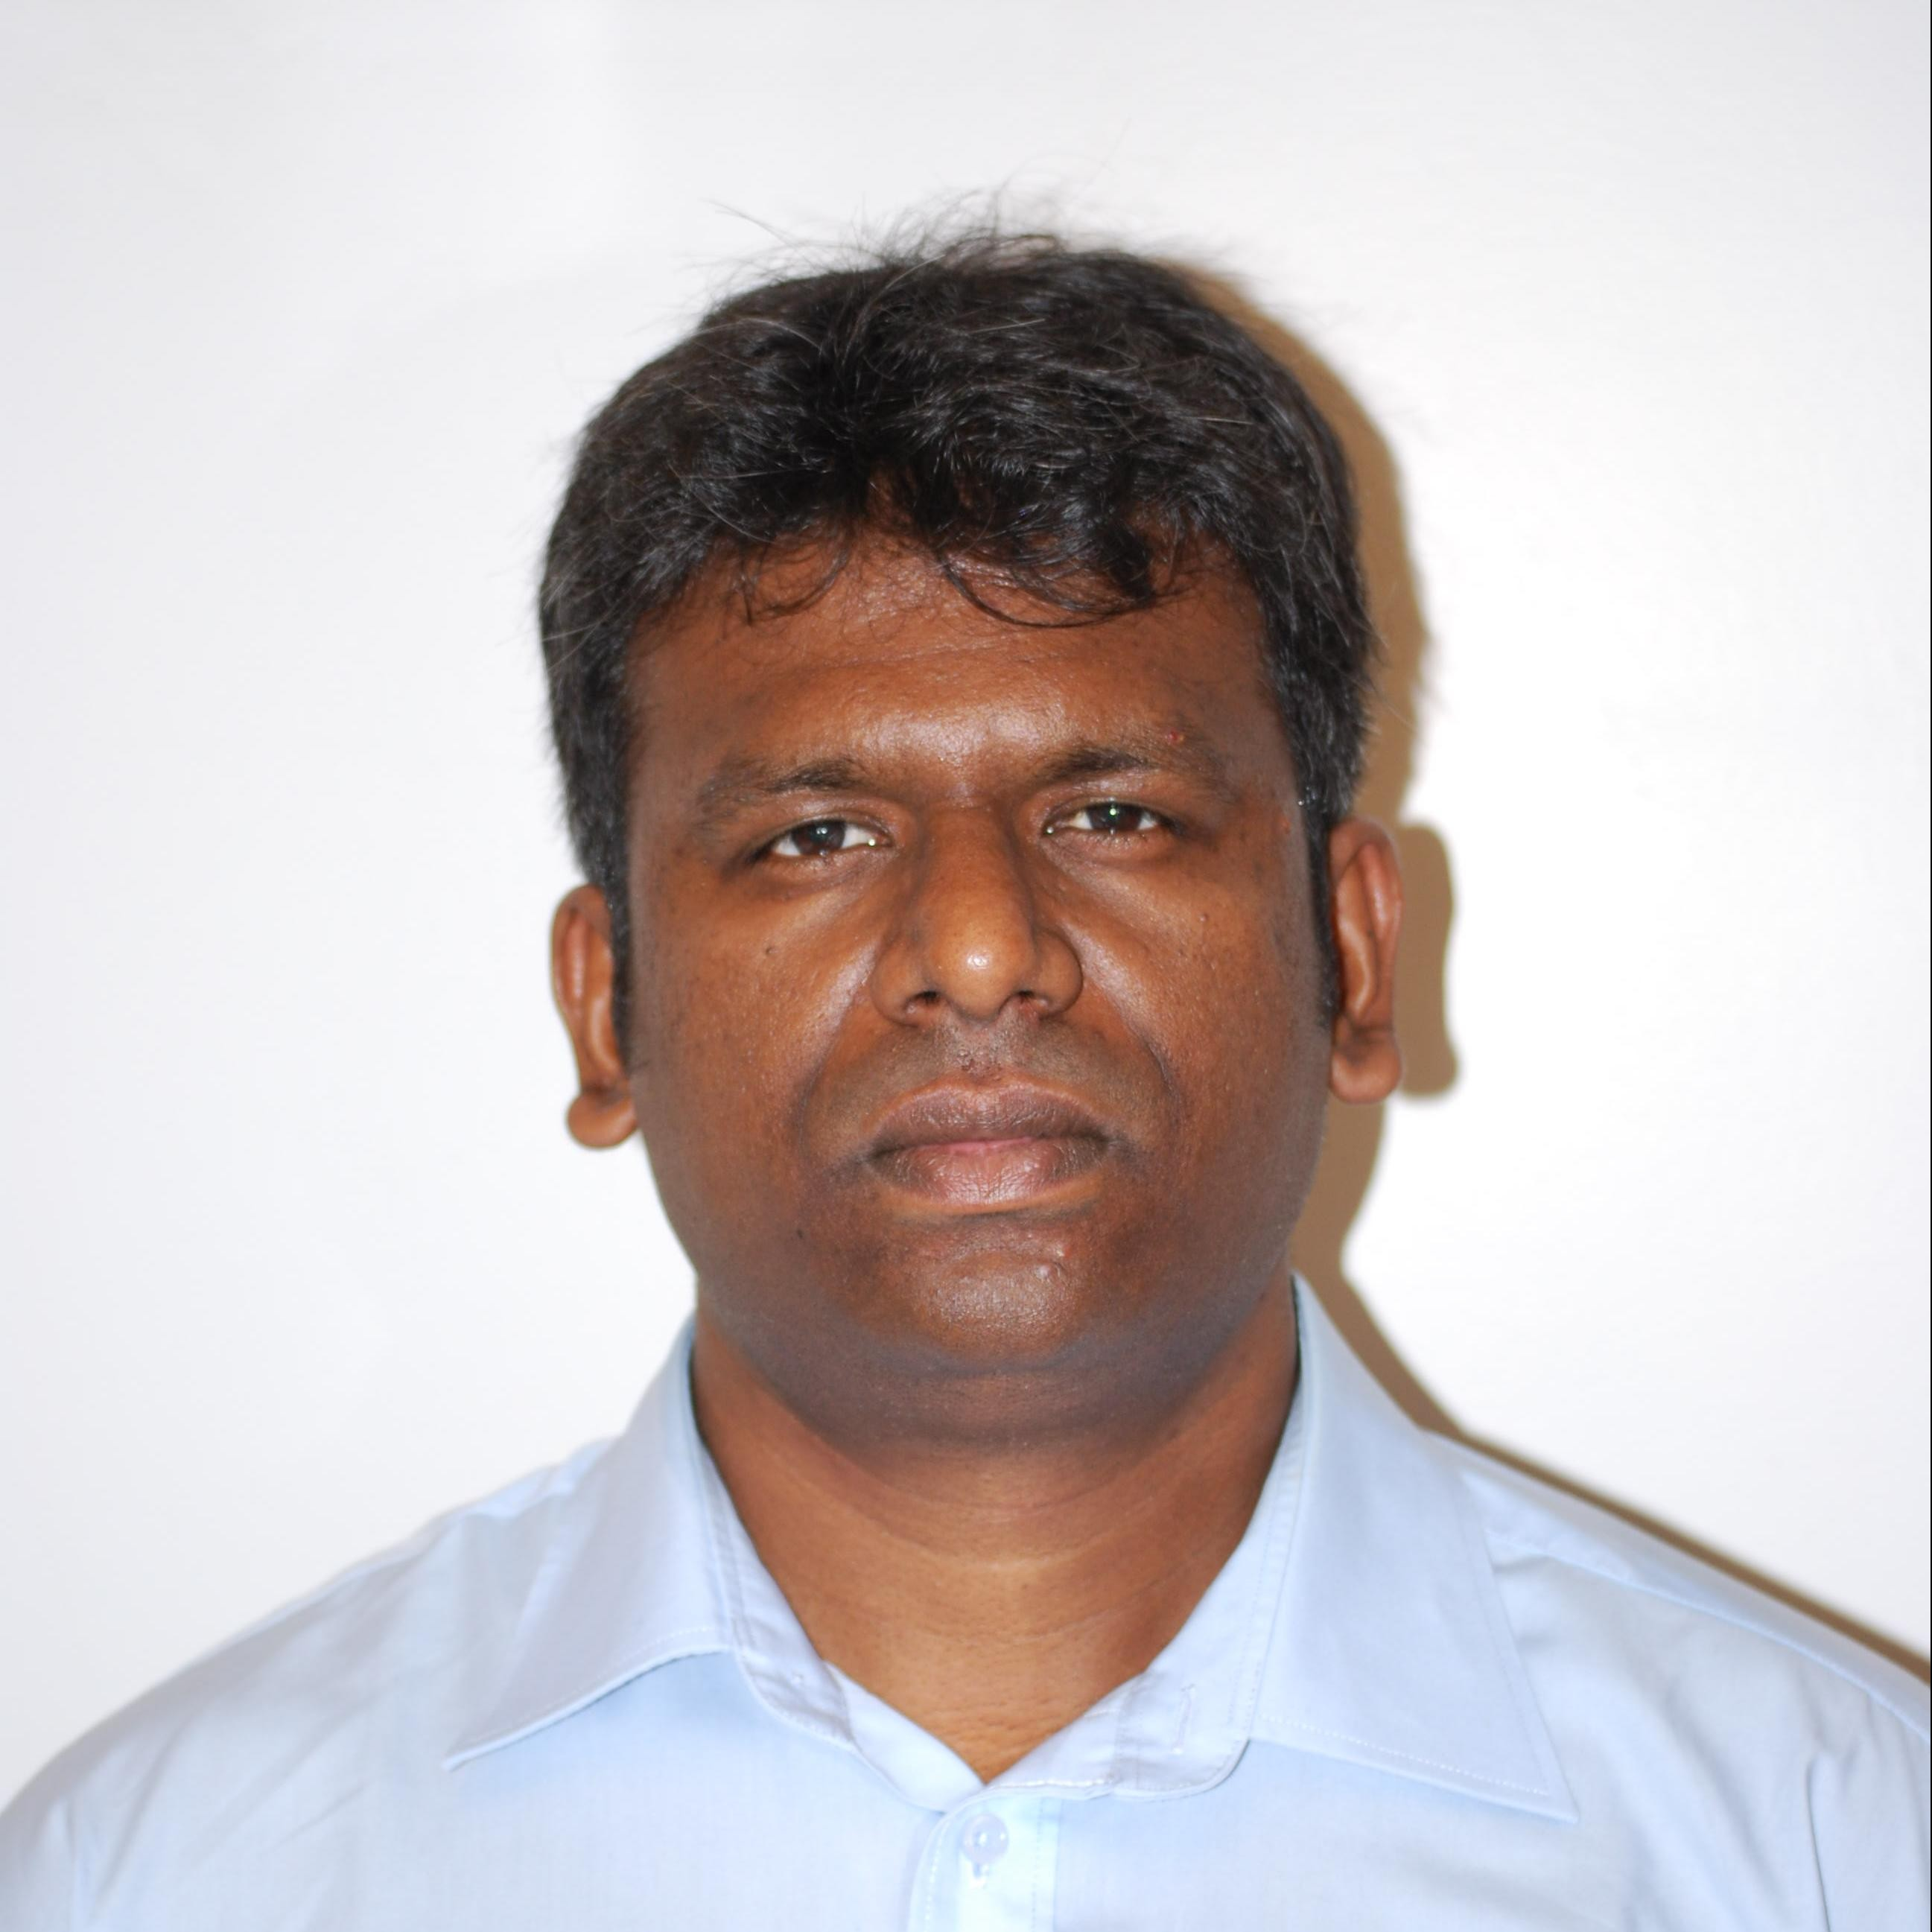 Doctor Somasundar Kannan